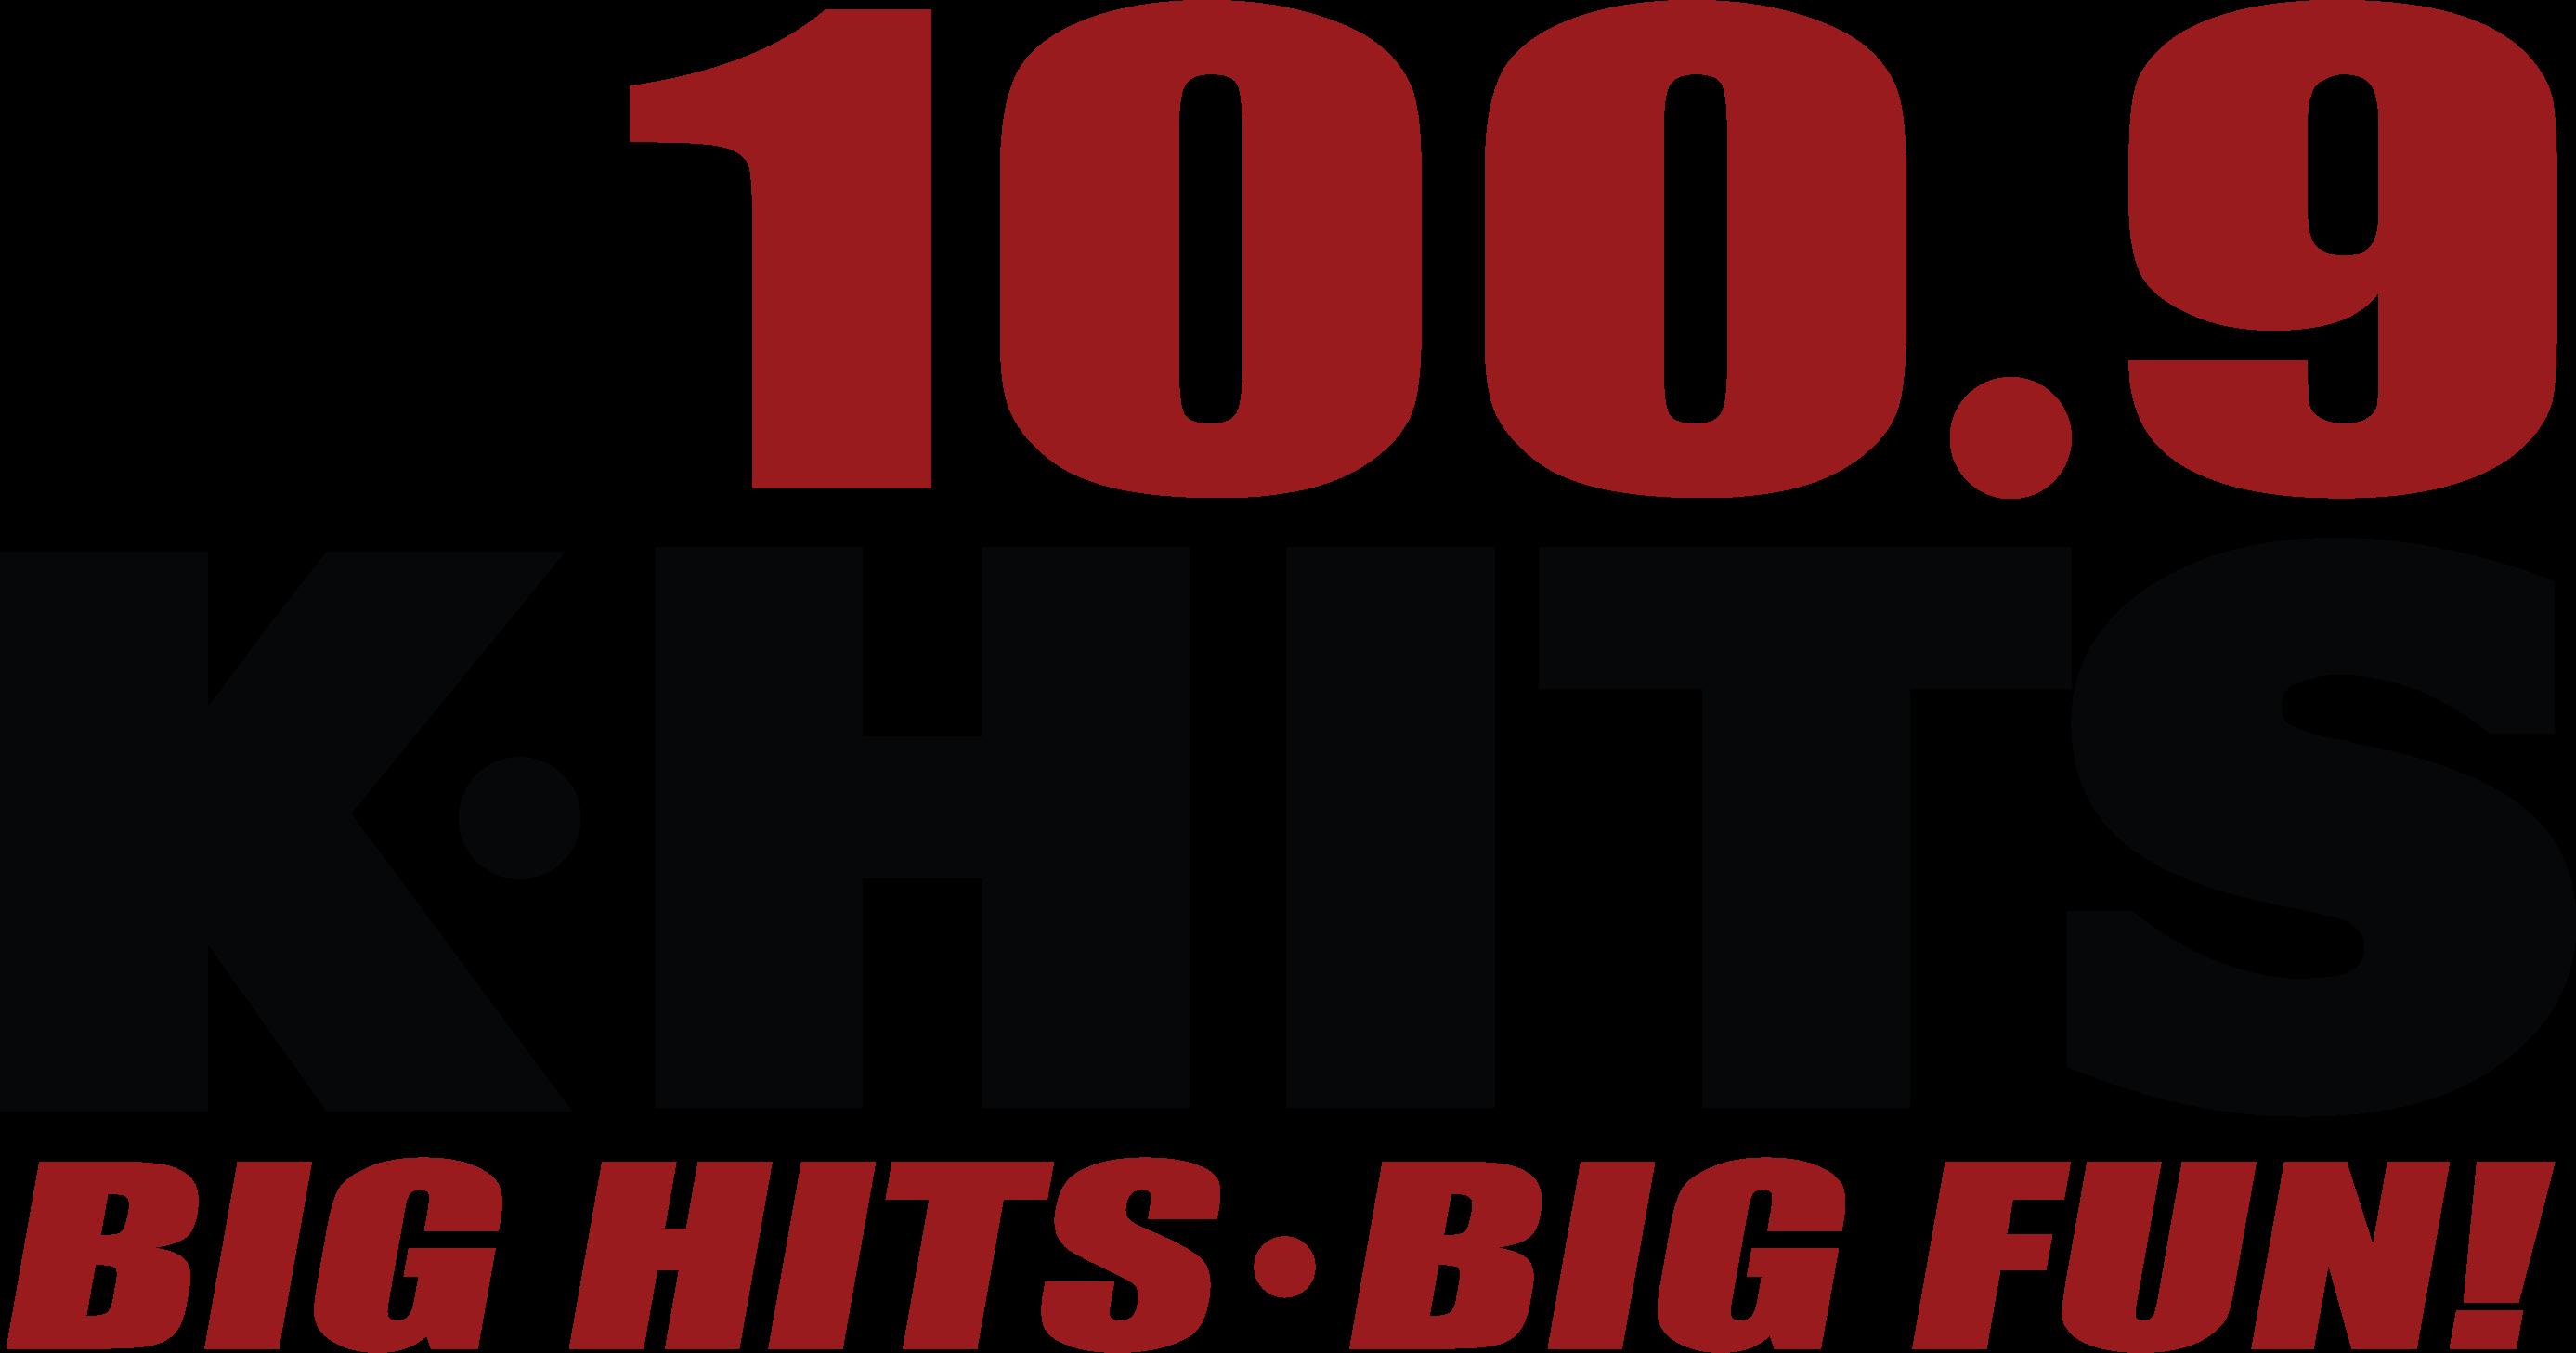 100.9 K-Hits